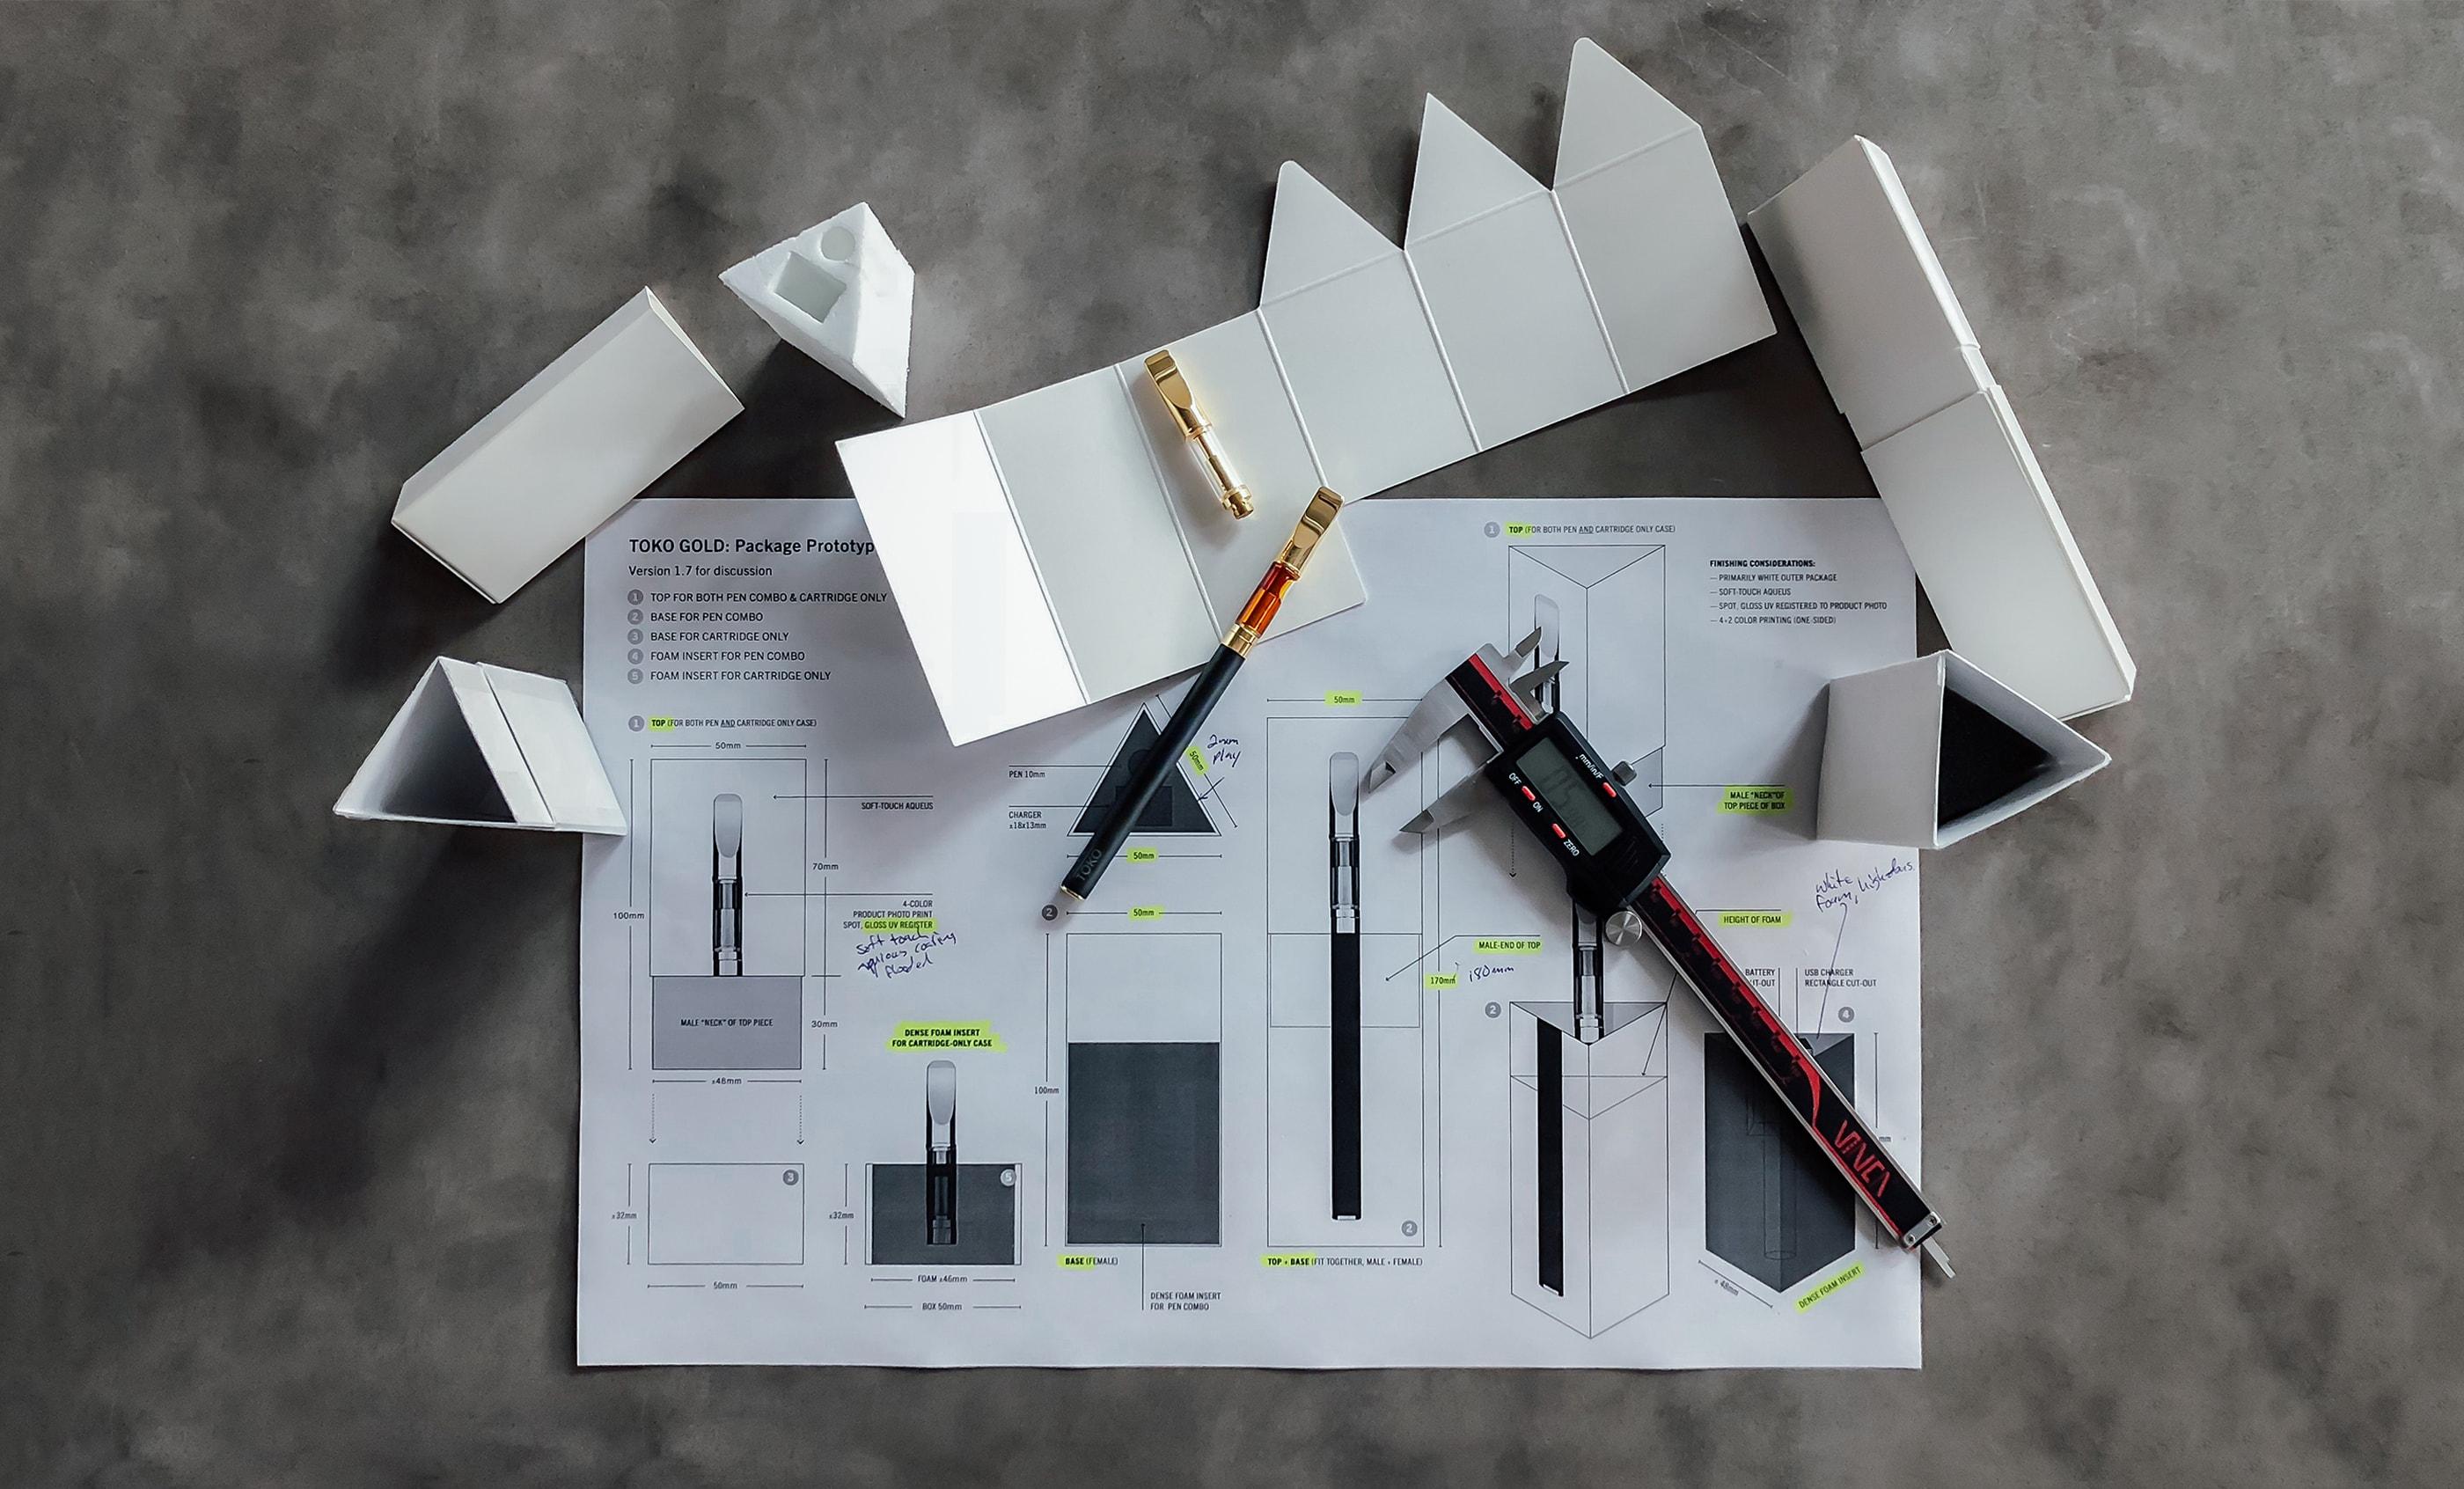 Toko Packaging Design Process